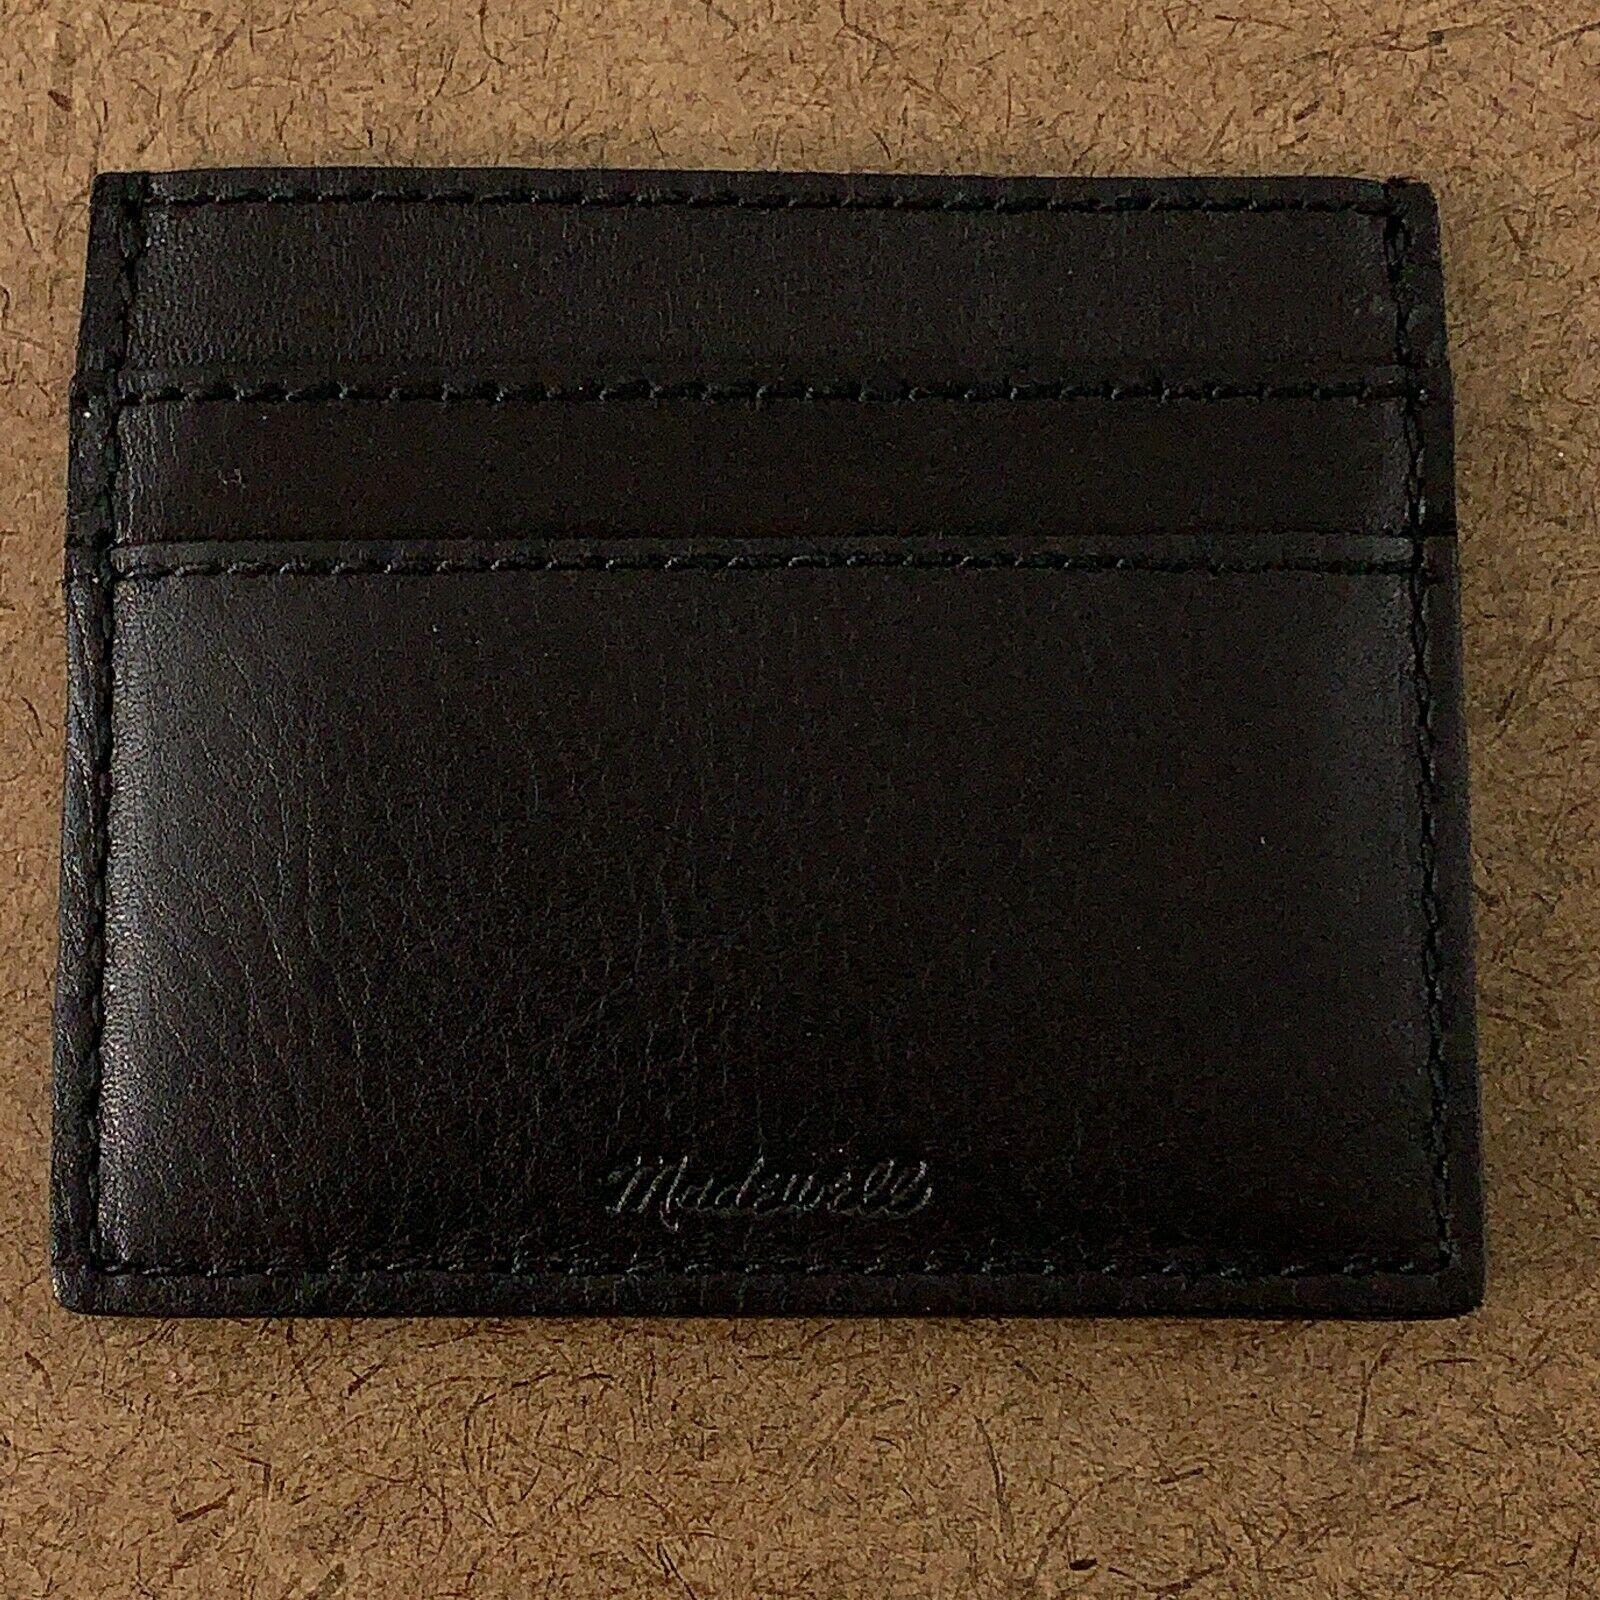 Madewell Women's True Black The Leather Card Case G2704 AHB Monogram NWT